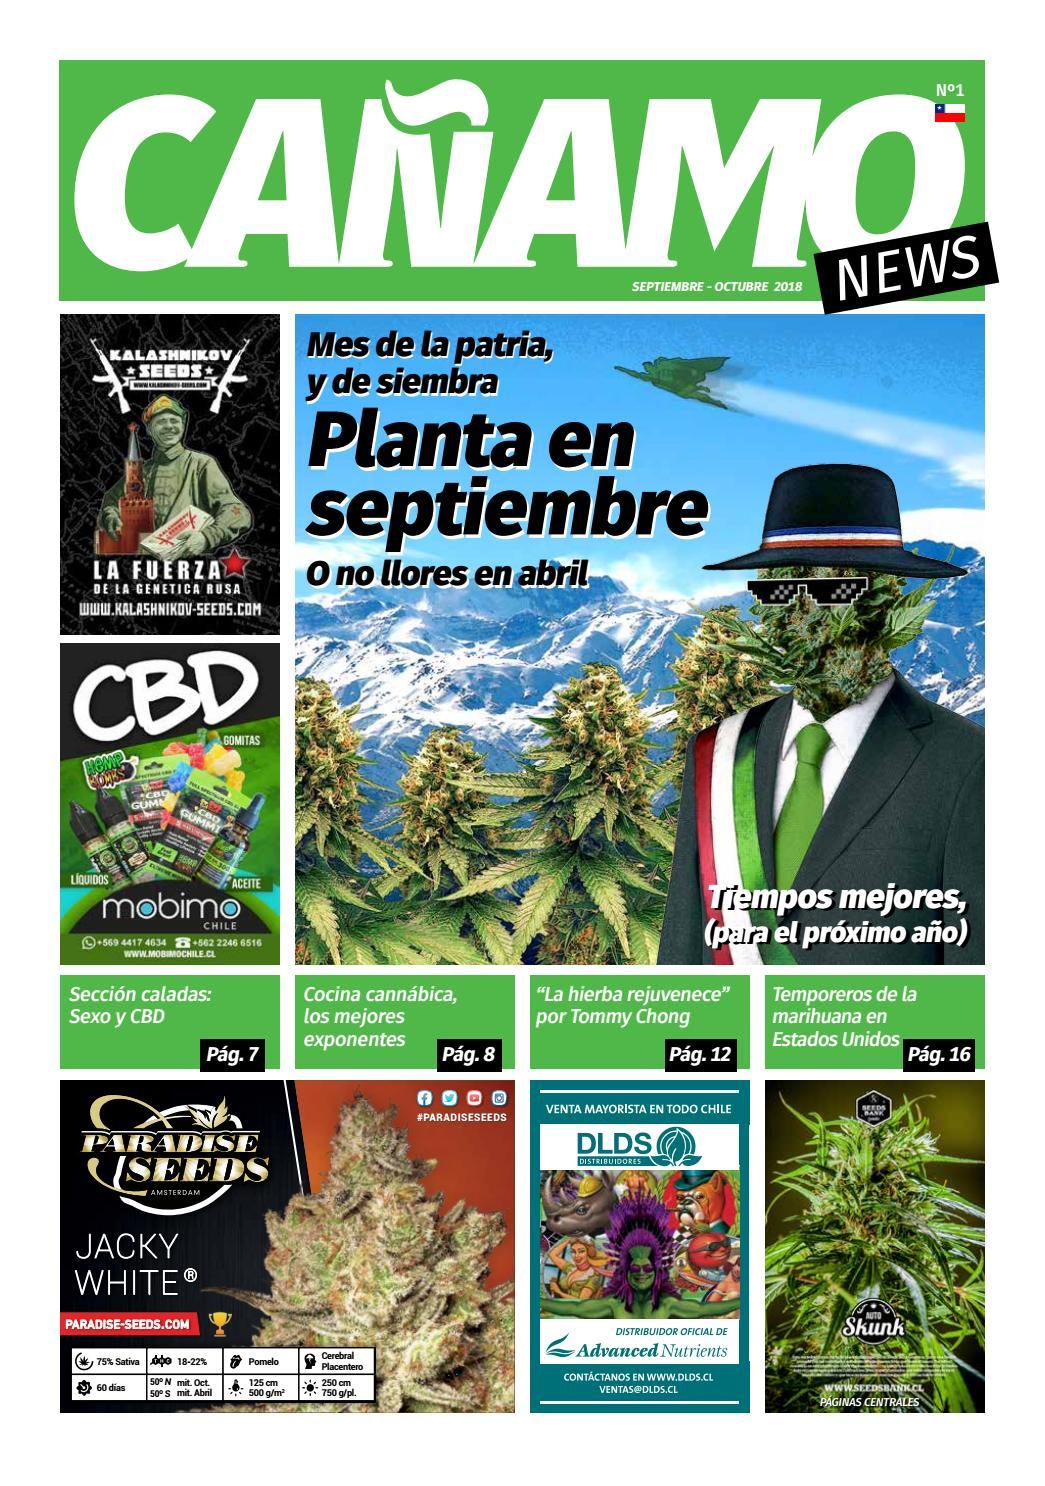 b69856cdf Cañamo News Nº1 - Septiembre/Octubre 2018 by Cañamo News / Weeds Chile -  issuu